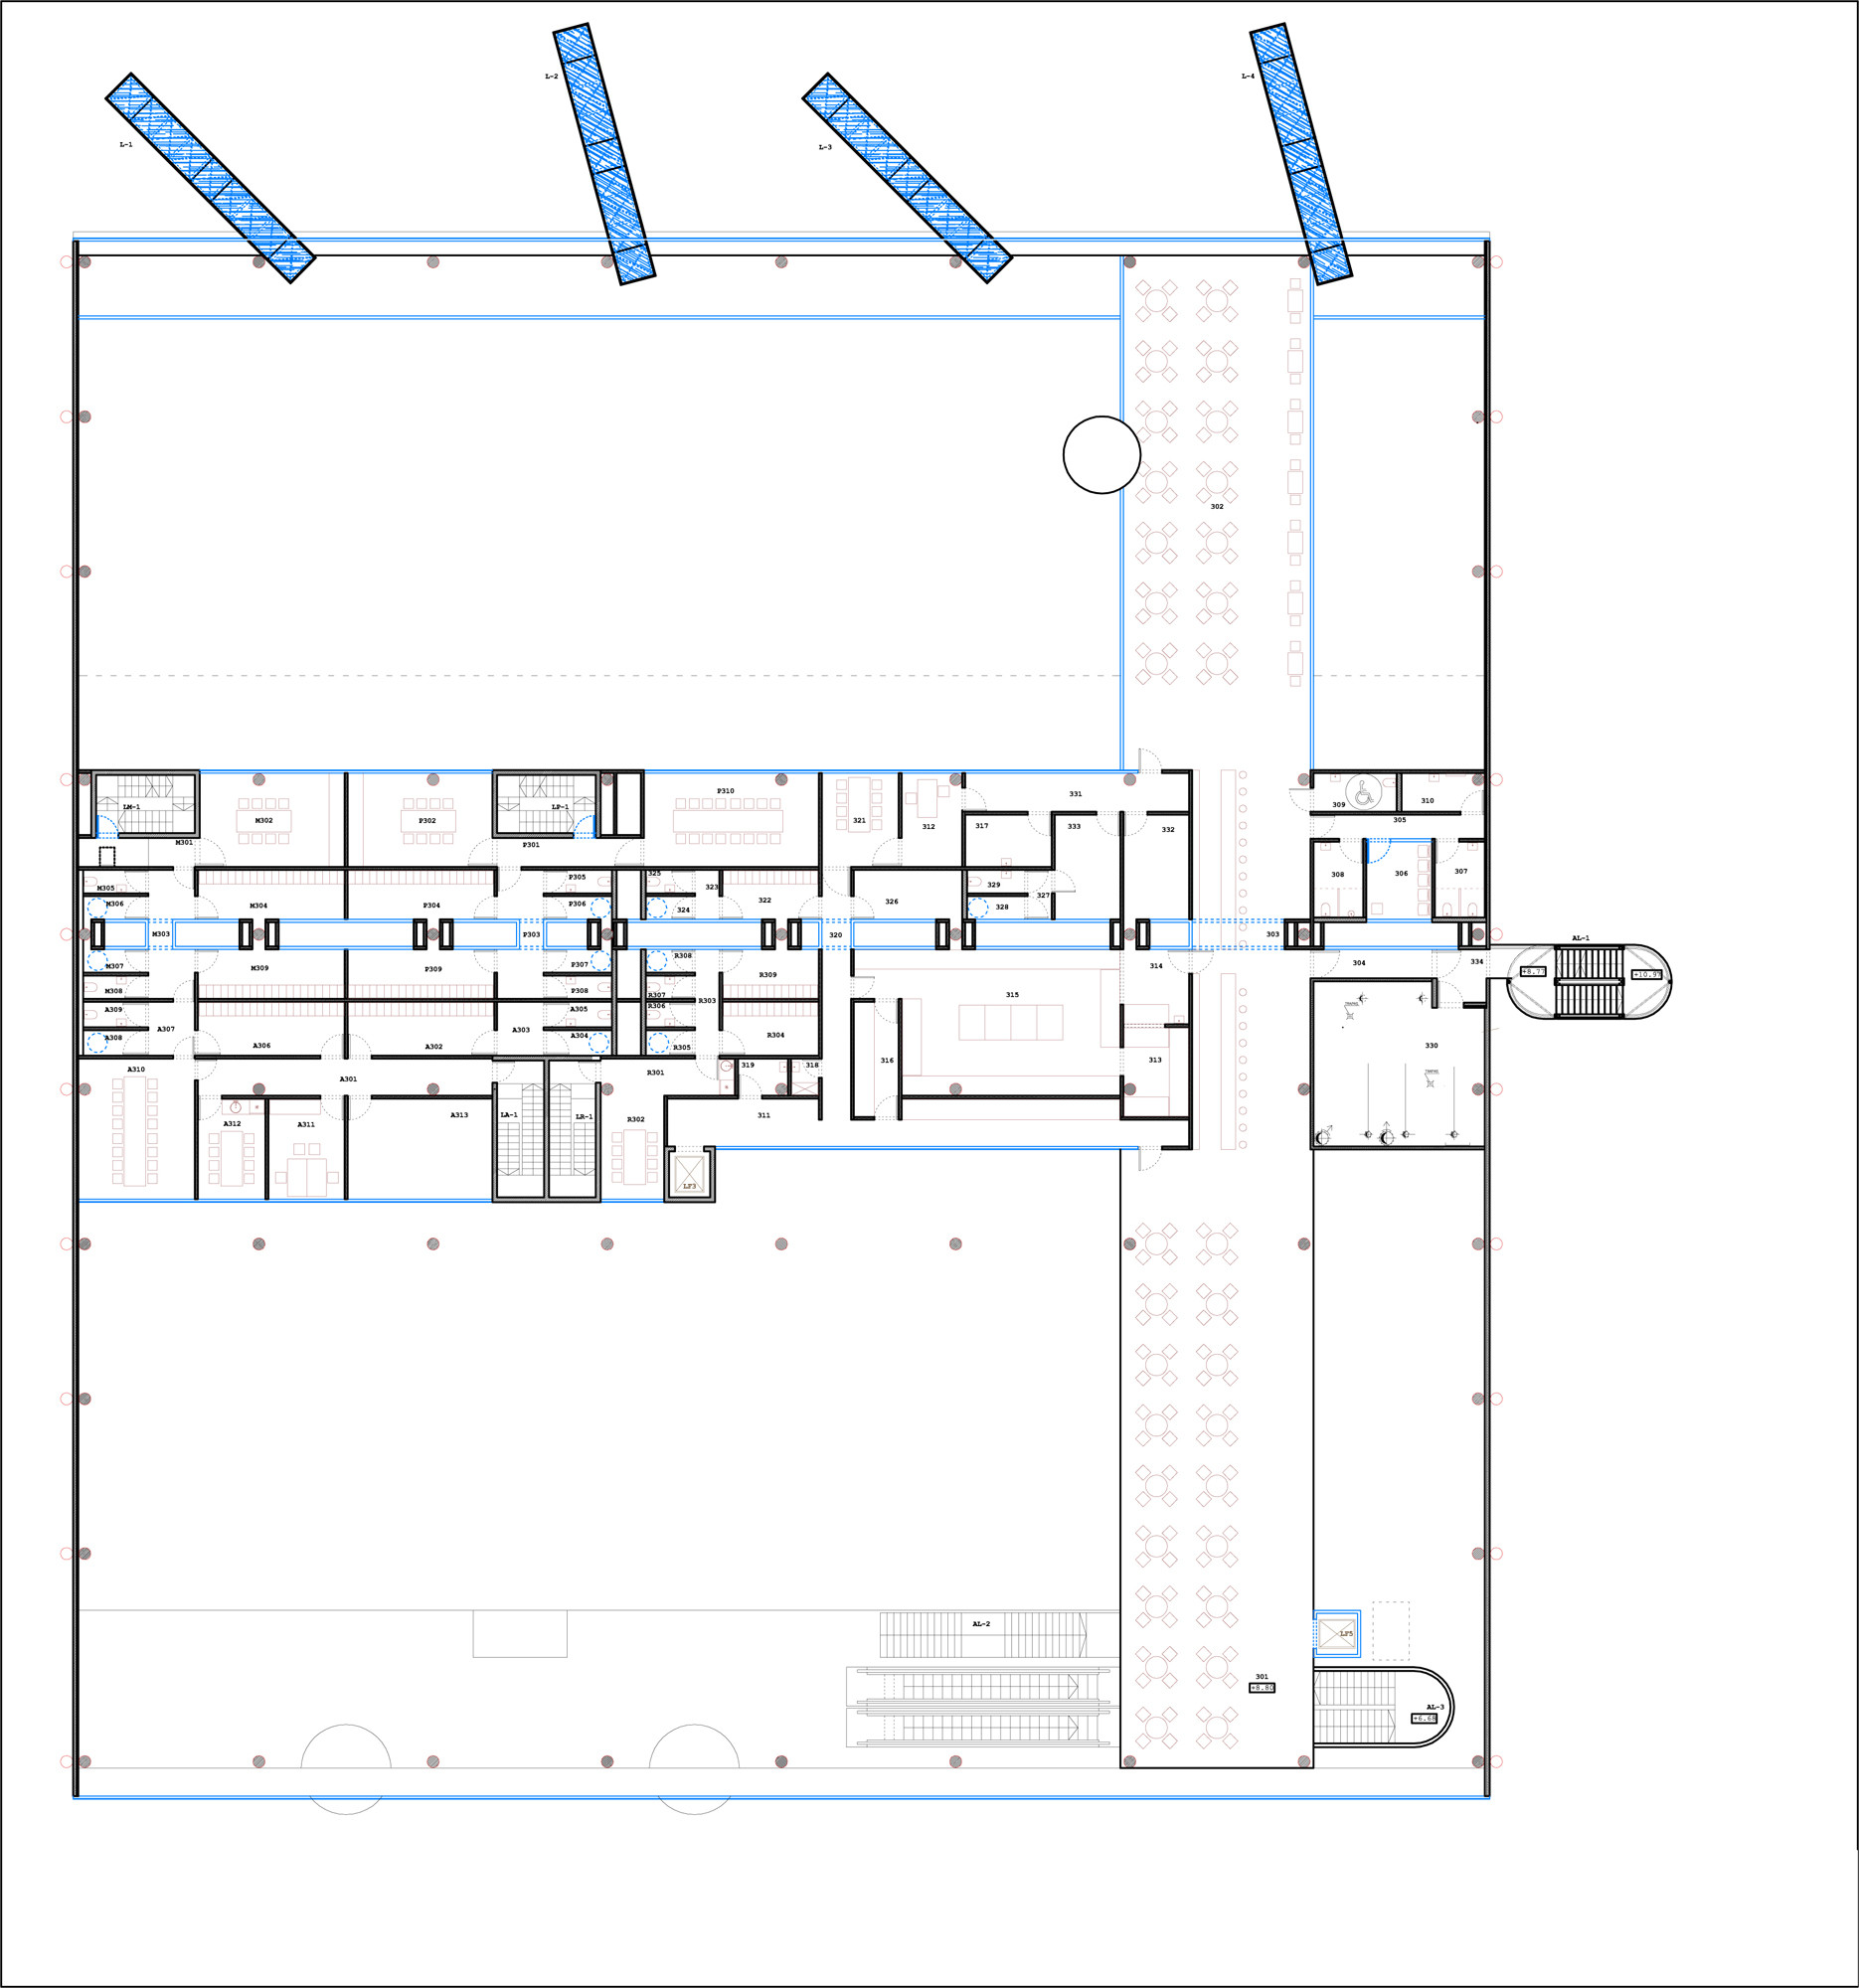 Airport Design Plan